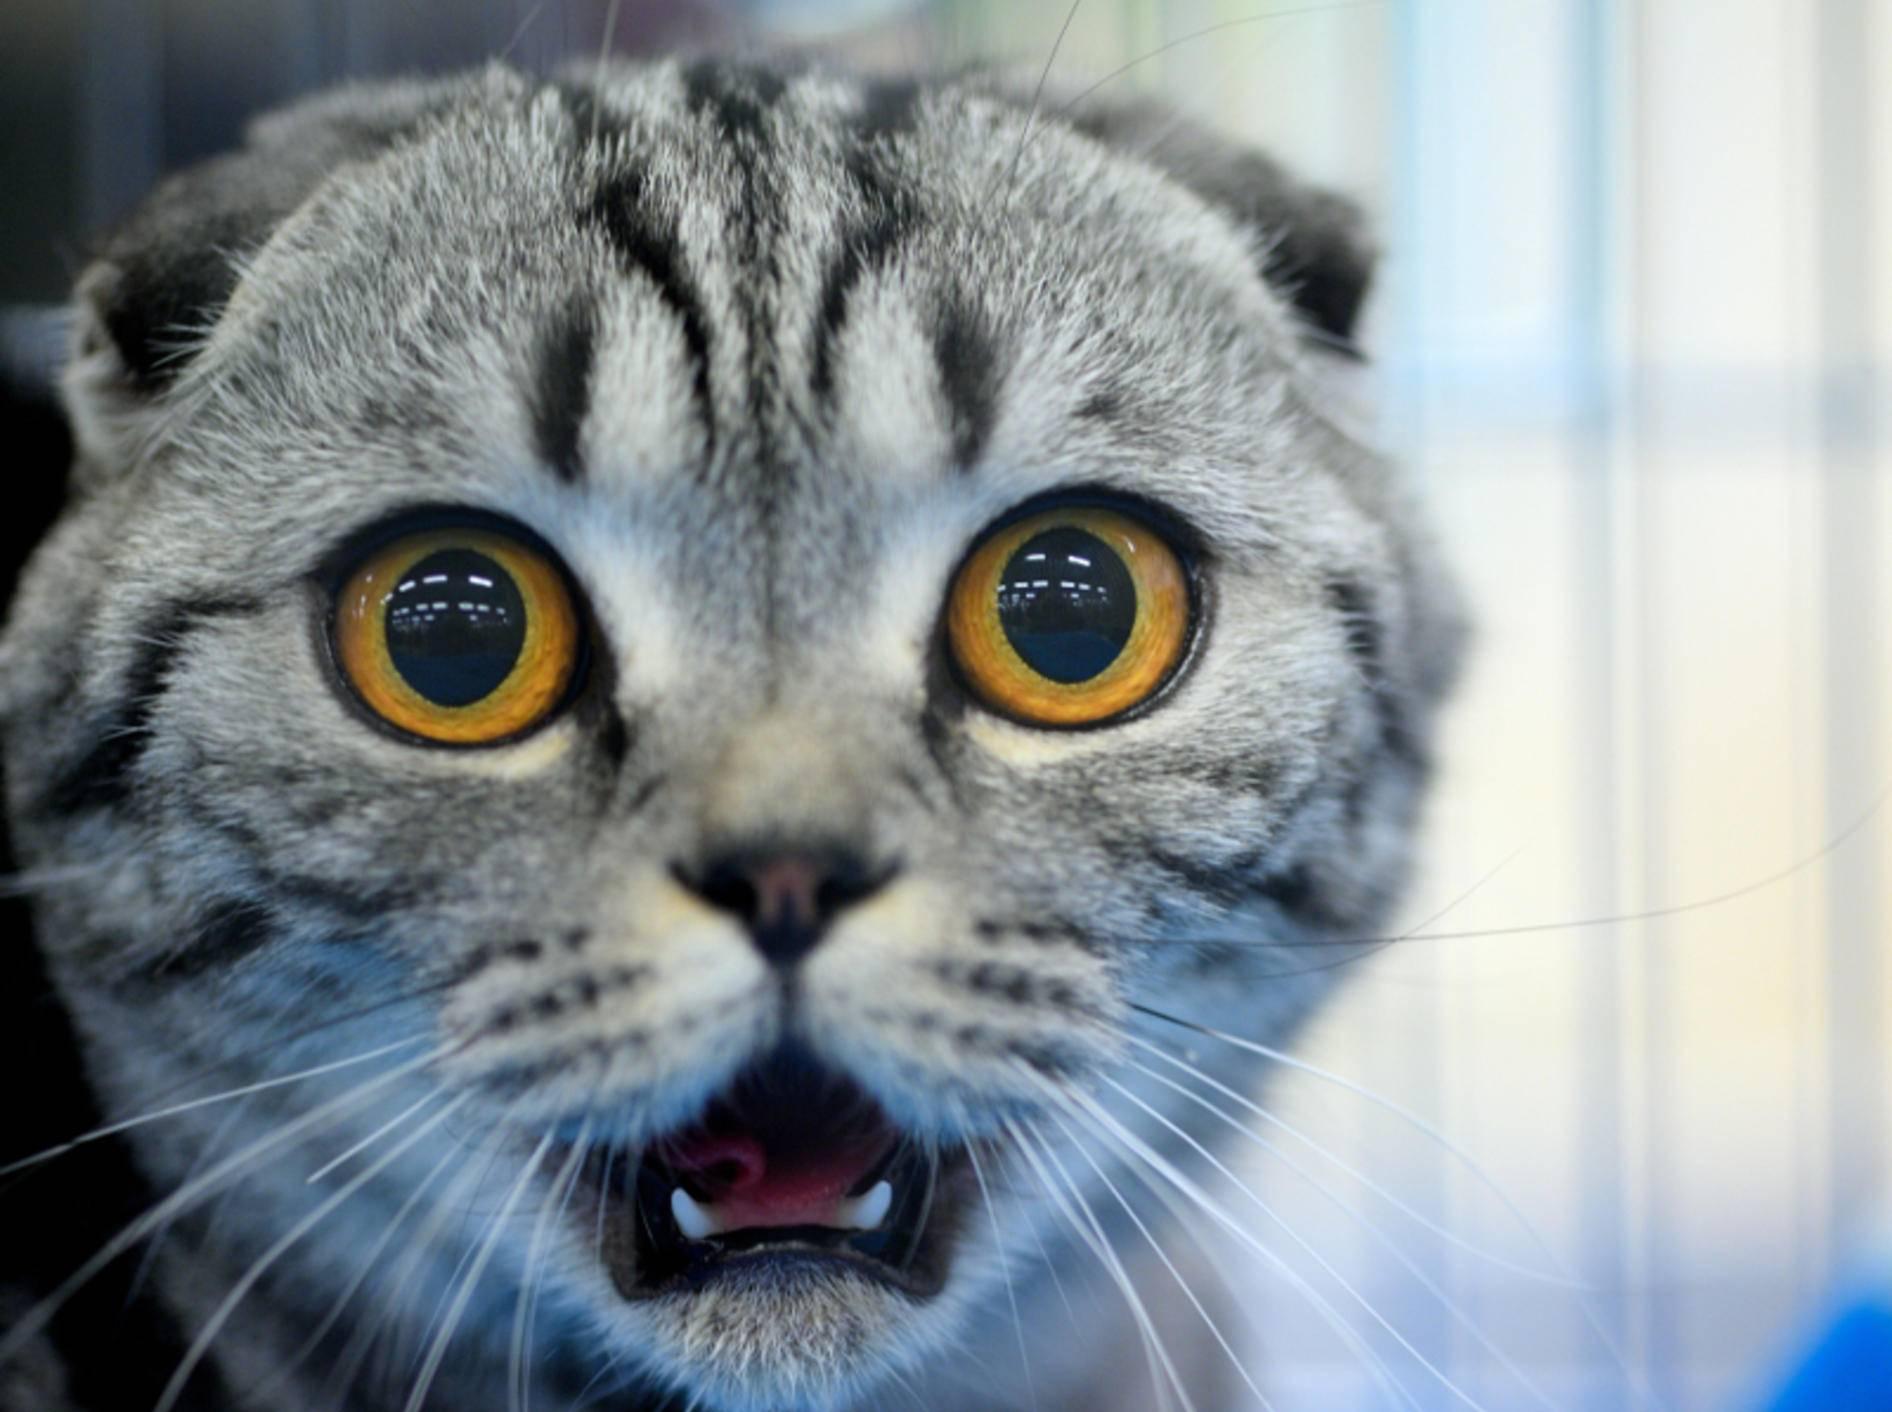 """Waaas? Kater Garfield ist bloß eine Comicfigur?"" – Bild: Shutterstock / The Len"